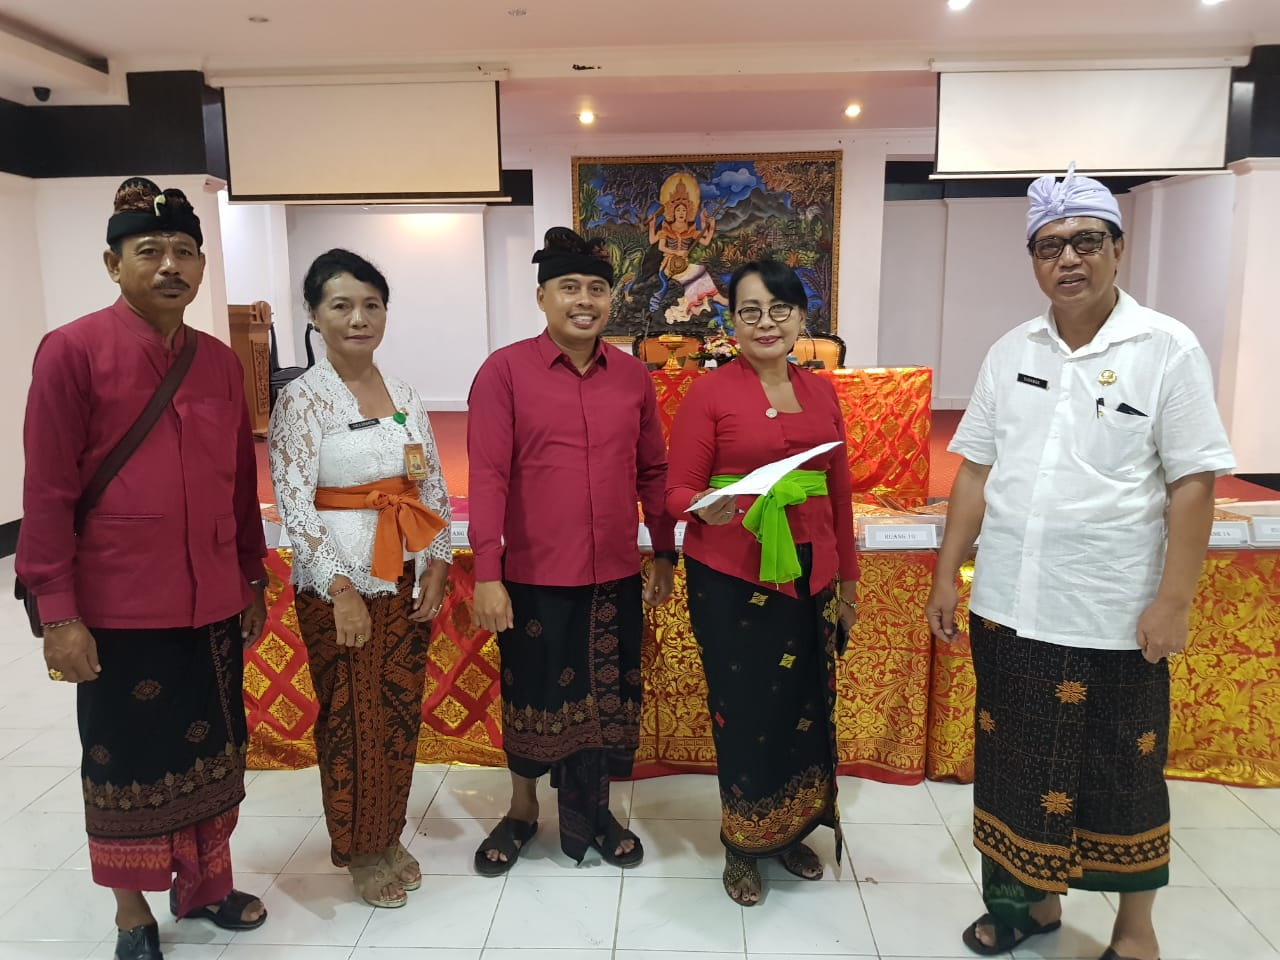 KADISDIKPORA Kota Denpasar, I Wayan Gunawan, didampingi Ni Made Tirta Ariantini dan Ni Wayan Nadi Supartini saat memantau pelaksanaan pemantapan UN di SMP Dwijendra Denpasar, Senin (9/3/2020). Foto: putra sasmitha